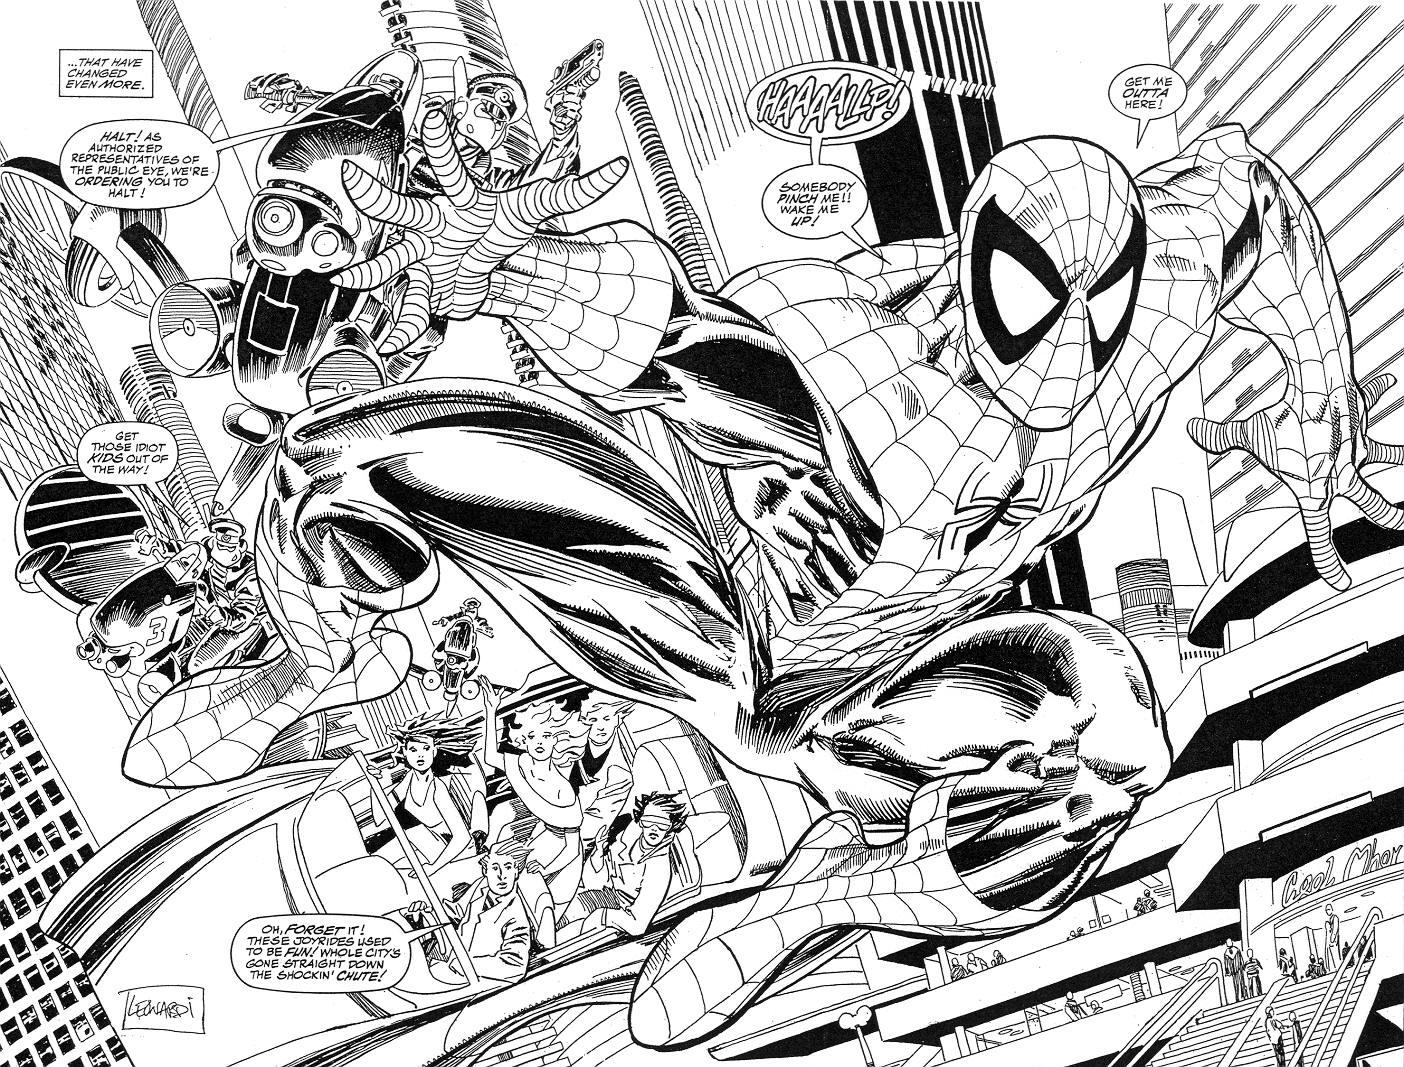 1404x1067 Spider Man 2099 Graphic Novel, Pgs. 2 3, In Eric Dls's Leonardi